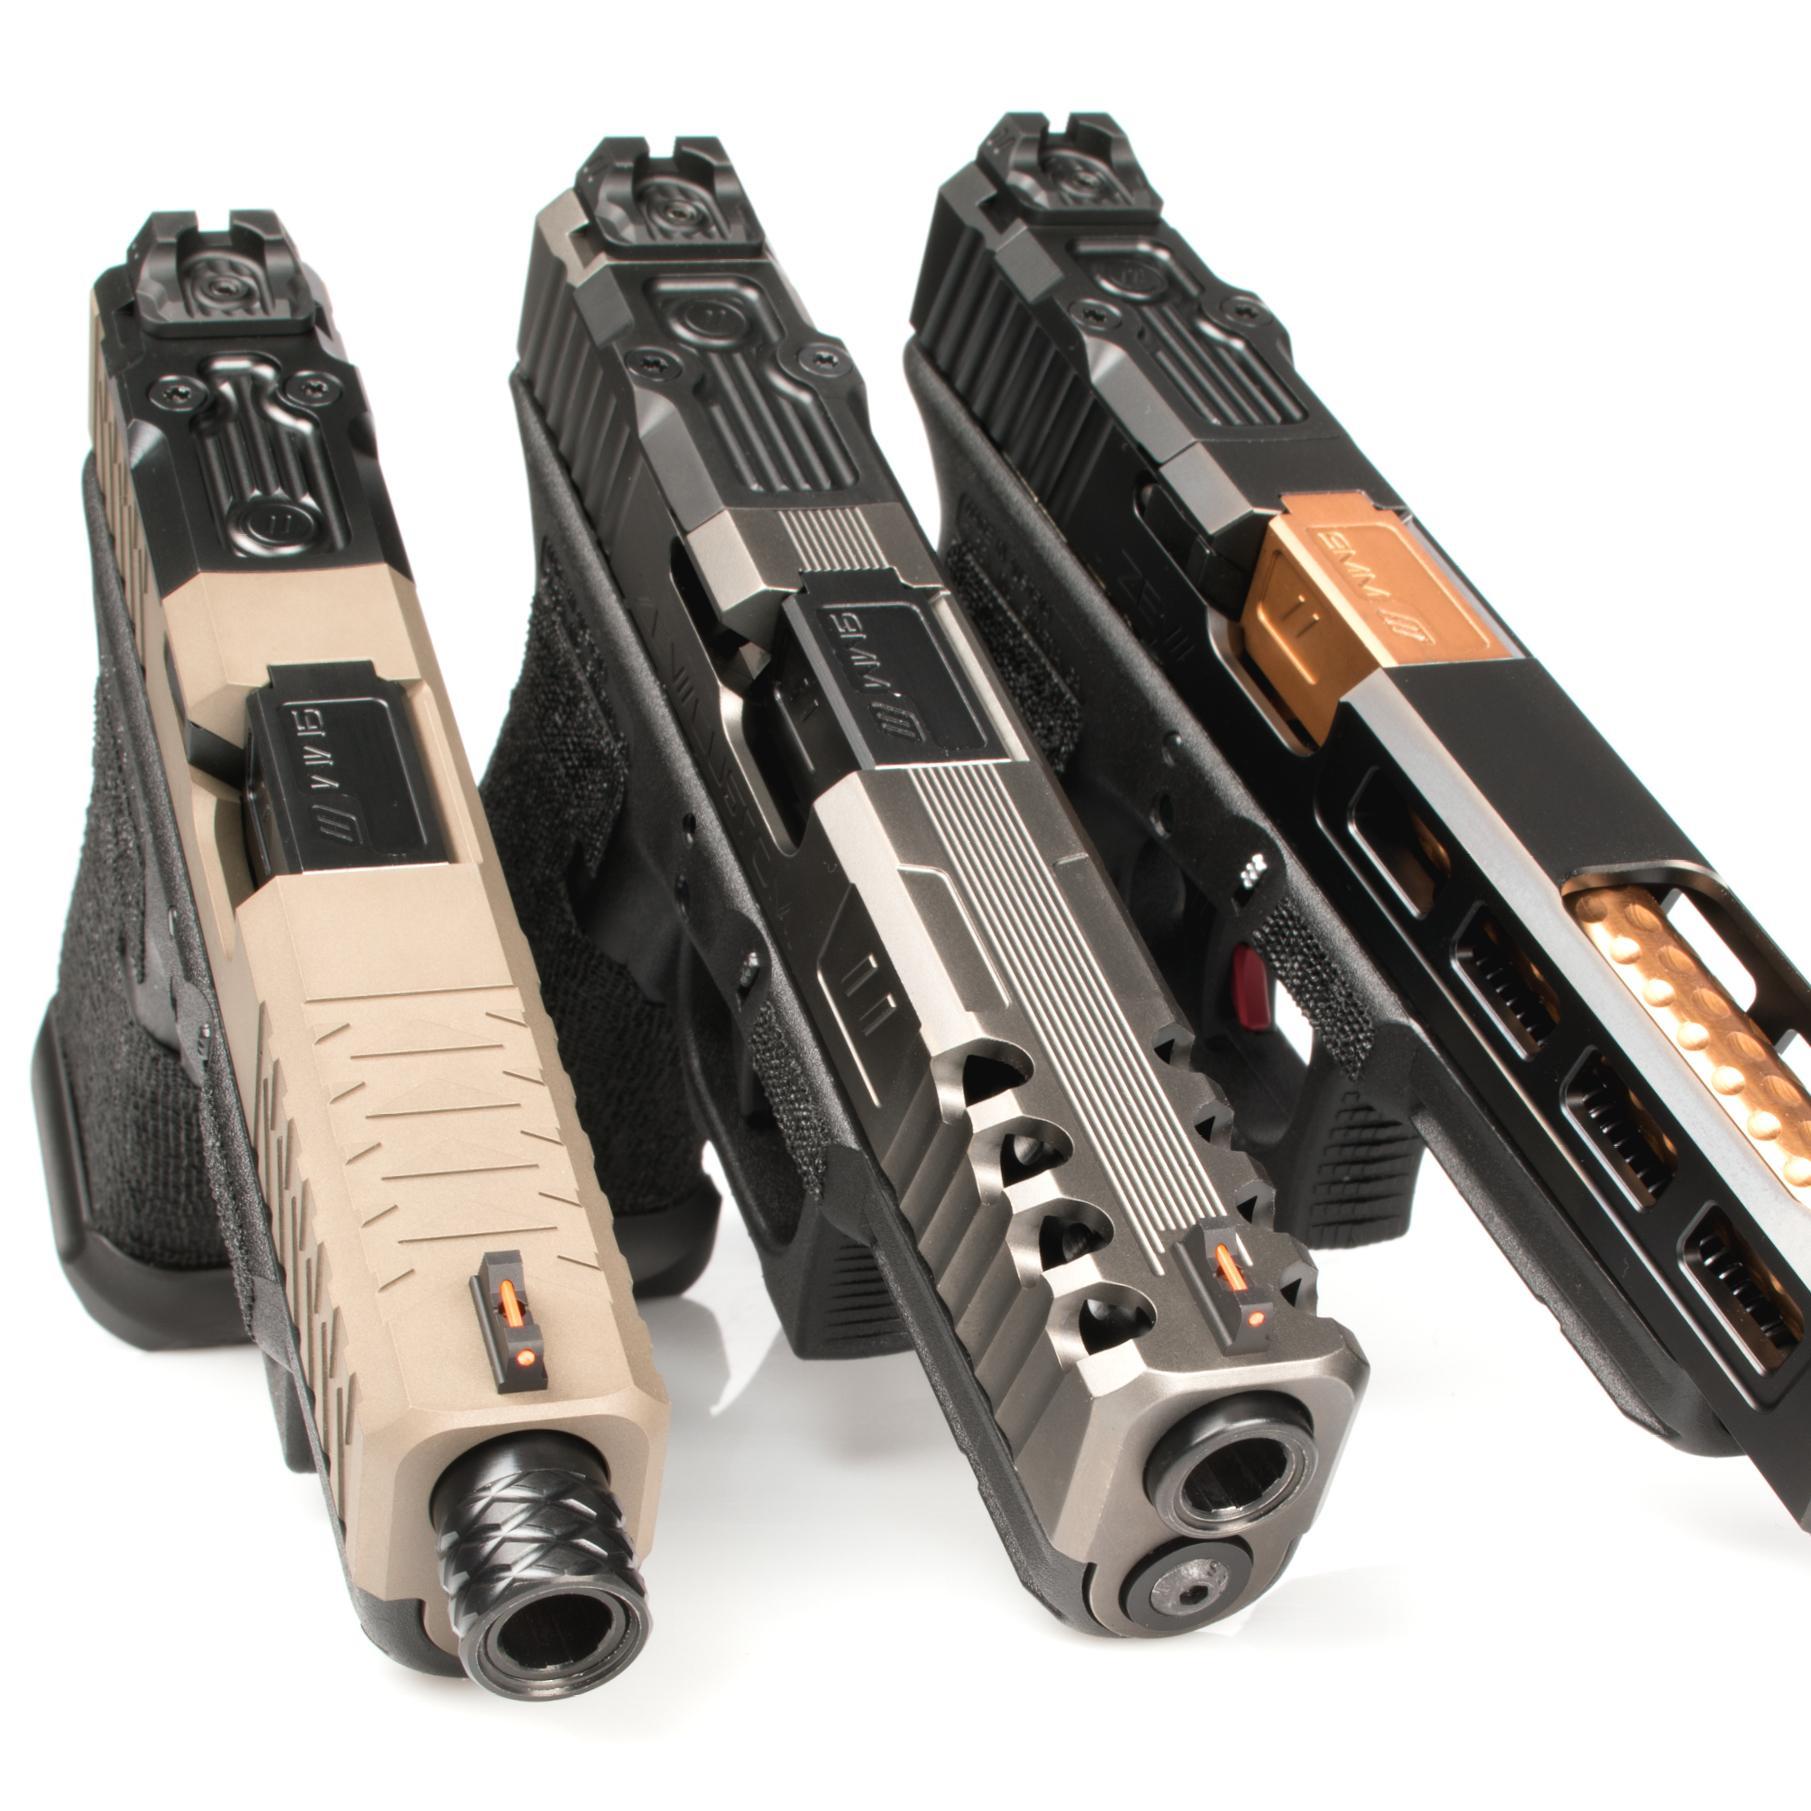 Glock Pistol Trigger Barrel Slide And Other Premium Upgrades 19 Diagram Gun Mods